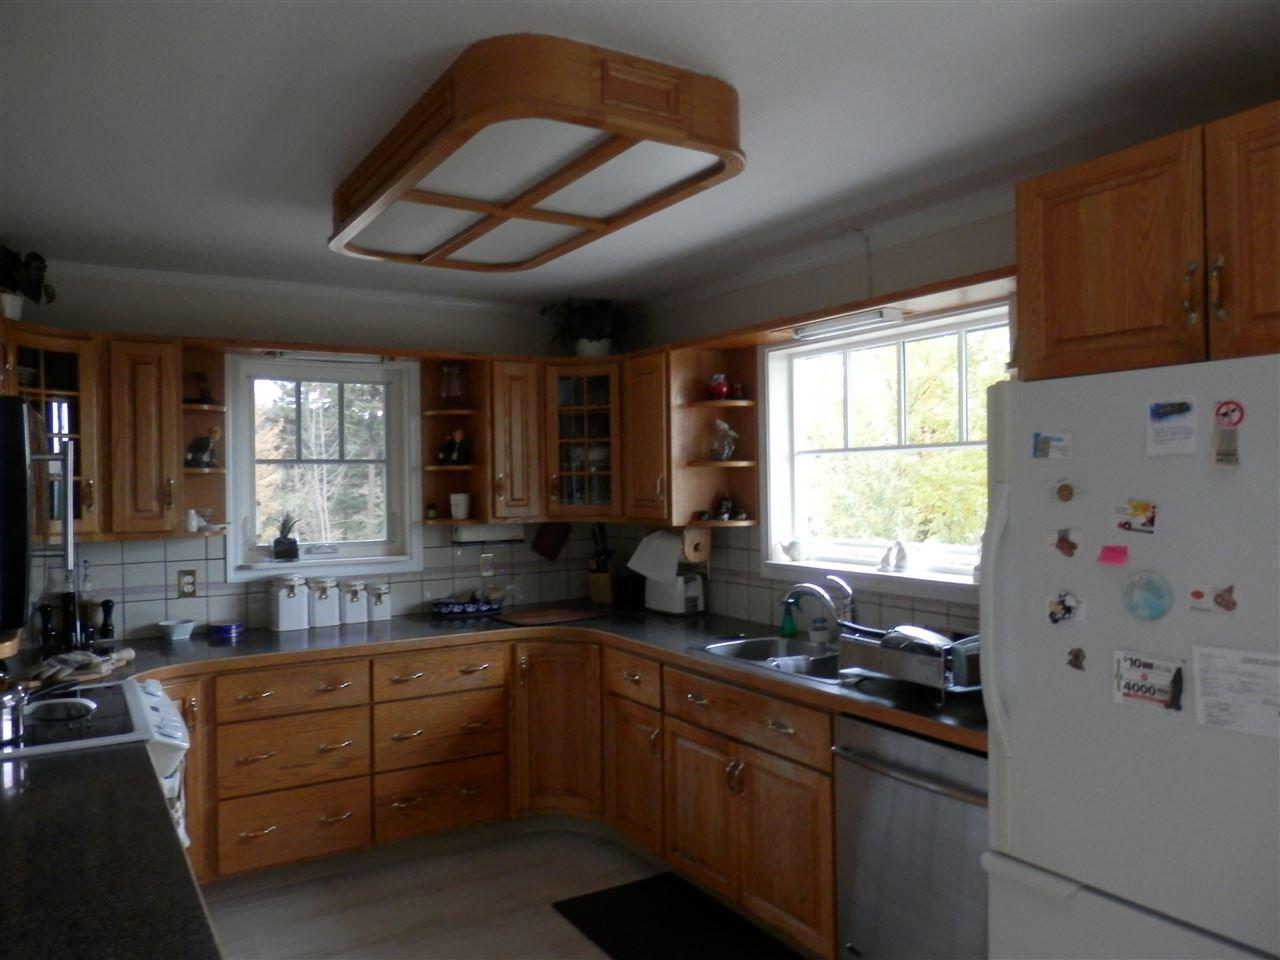 Photo 6: Photos: 935 HODGSON Road in Williams Lake: Esler/Dog Creek House for sale (Williams Lake (Zone 27))  : MLS®# R2414109